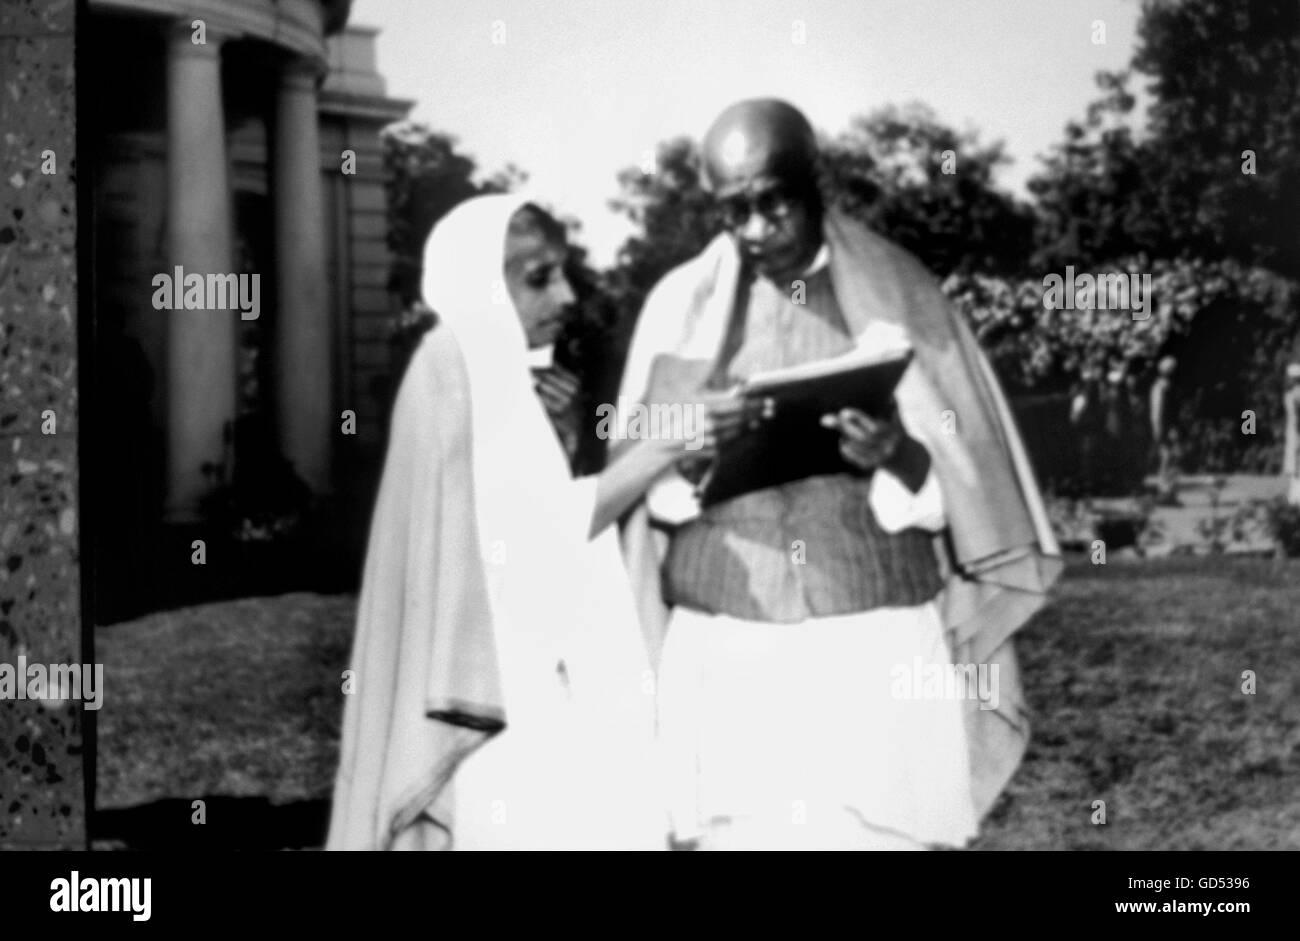 Sardar Patel Black and White Stock Photos & Images - Alamy